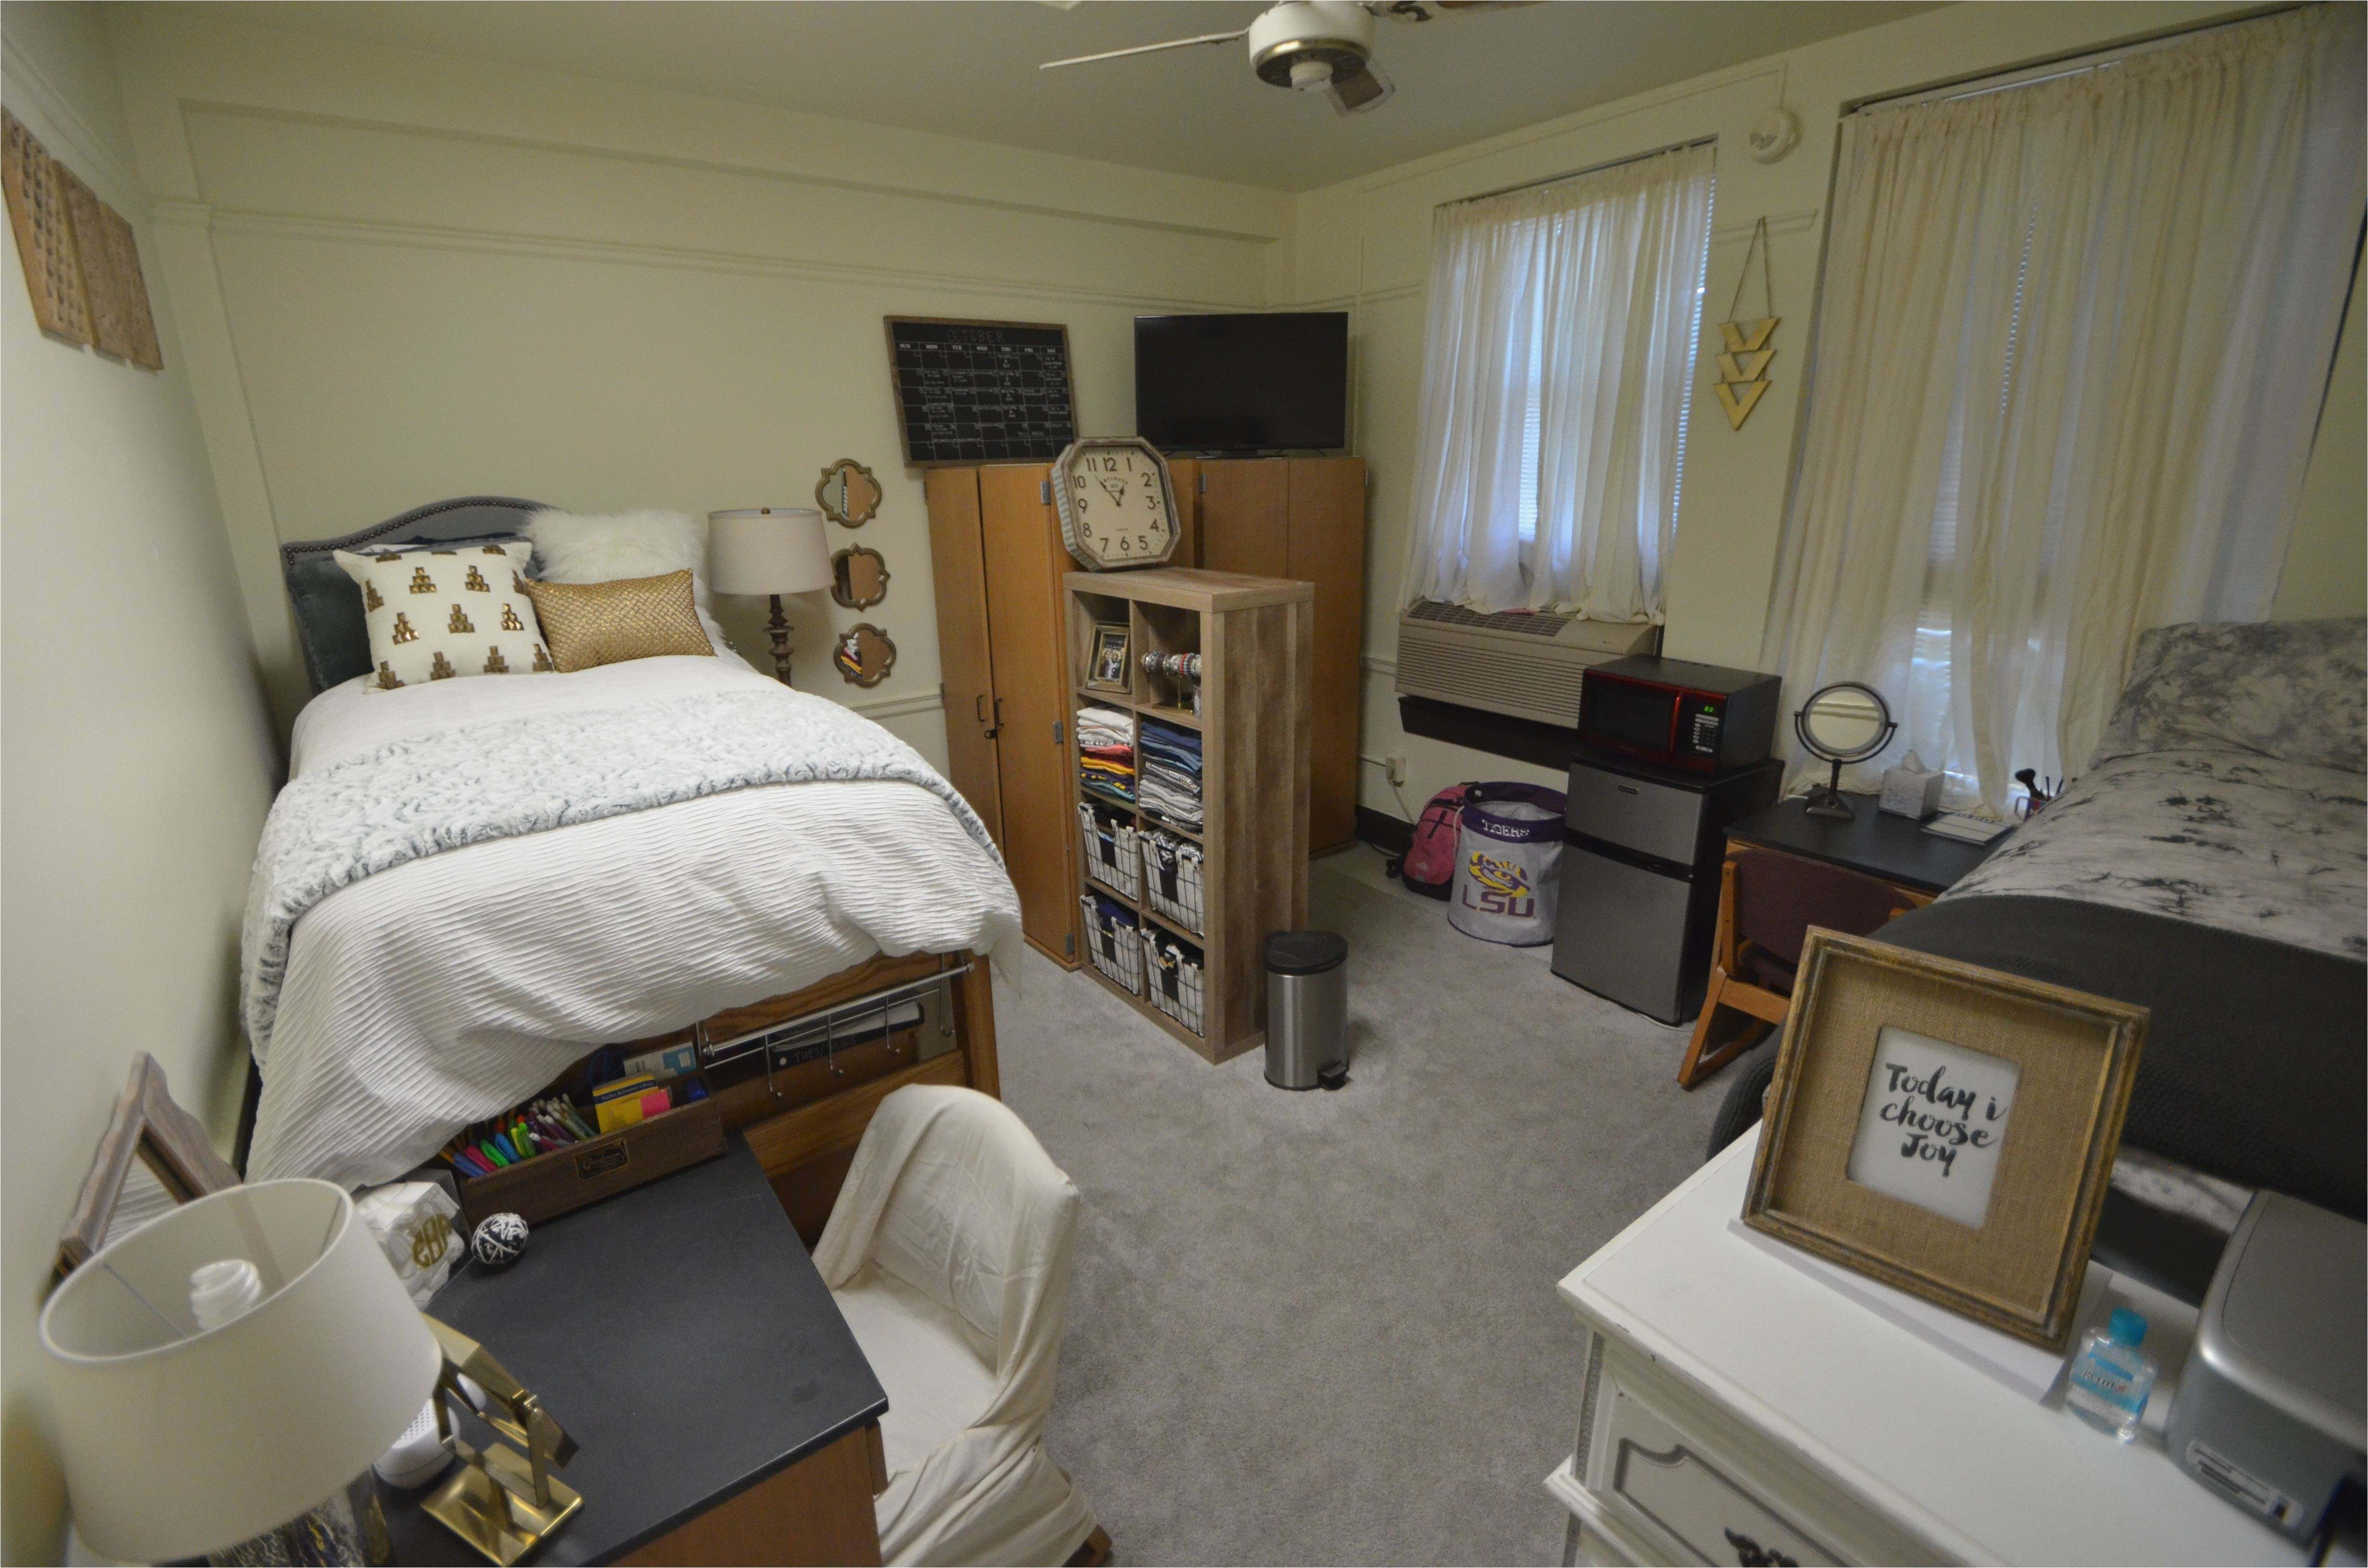 26 Bedroom Set for Boys Limited Bedroom Design Ideas Lovely Setup 0d with cheap kid bedroom sets